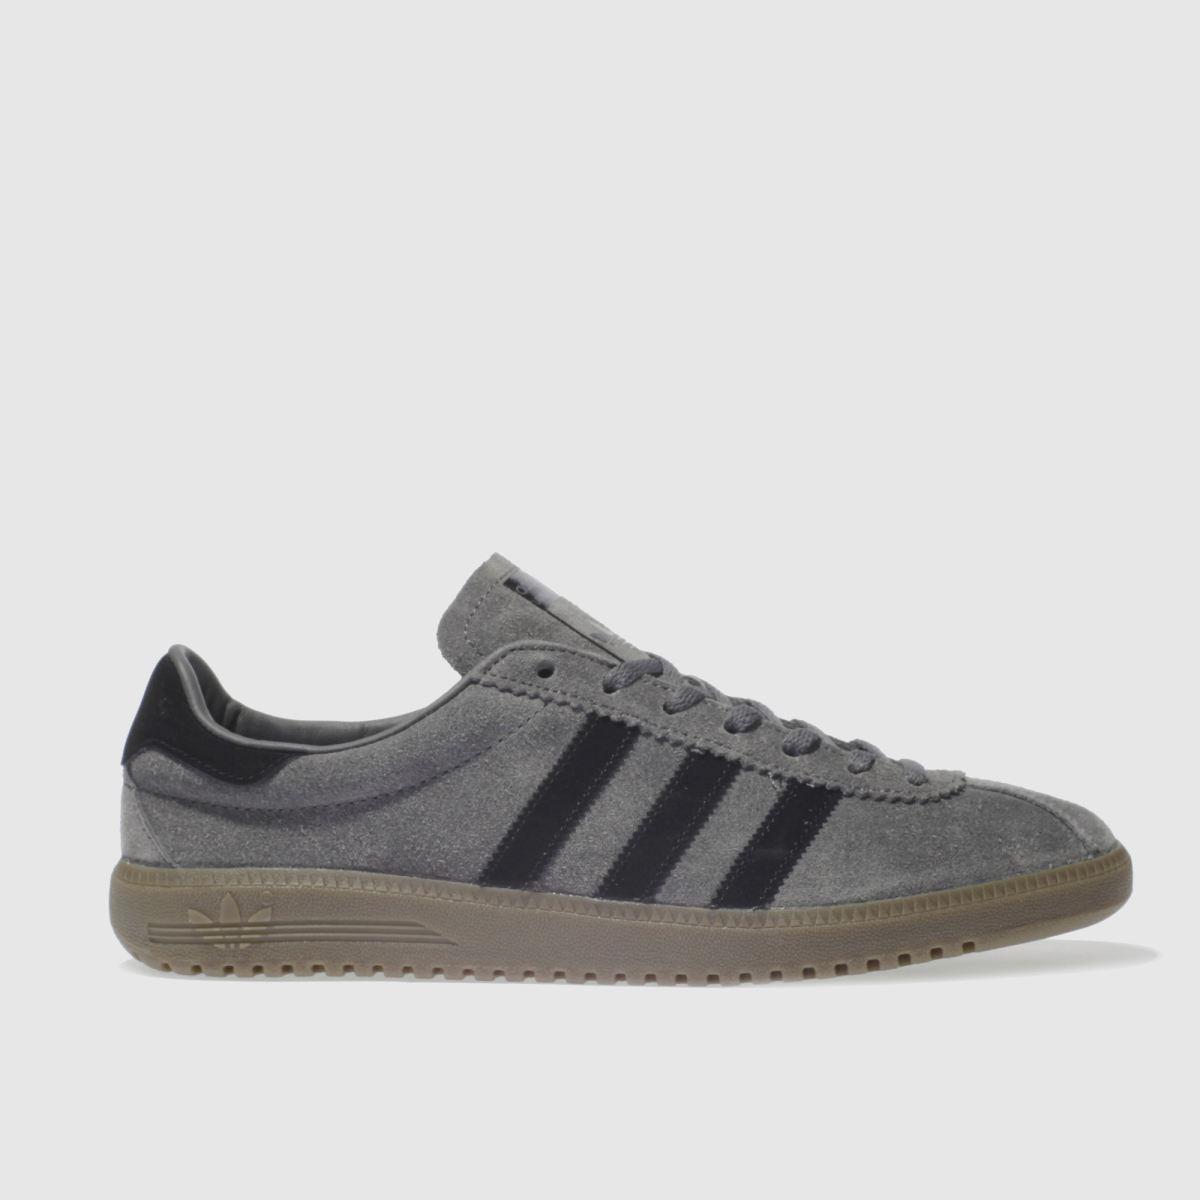 adidas grey & black bermuda trainers